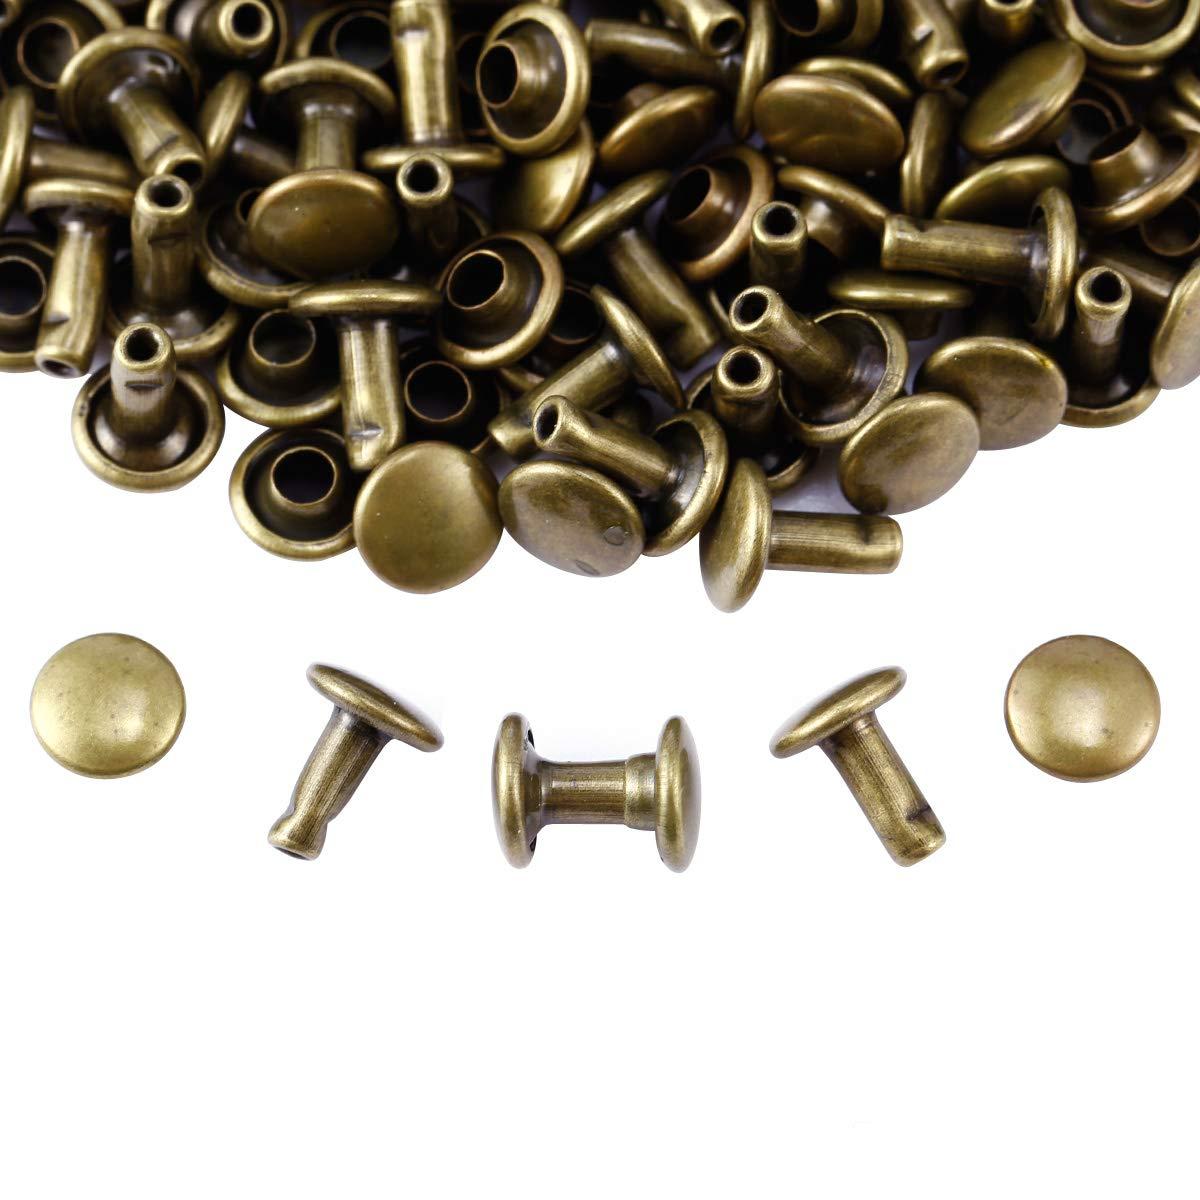 Anladia 300pcs Antique Brass Double Round Cap Tubular Rapid Rivet Stud for Leather Belt 6mm